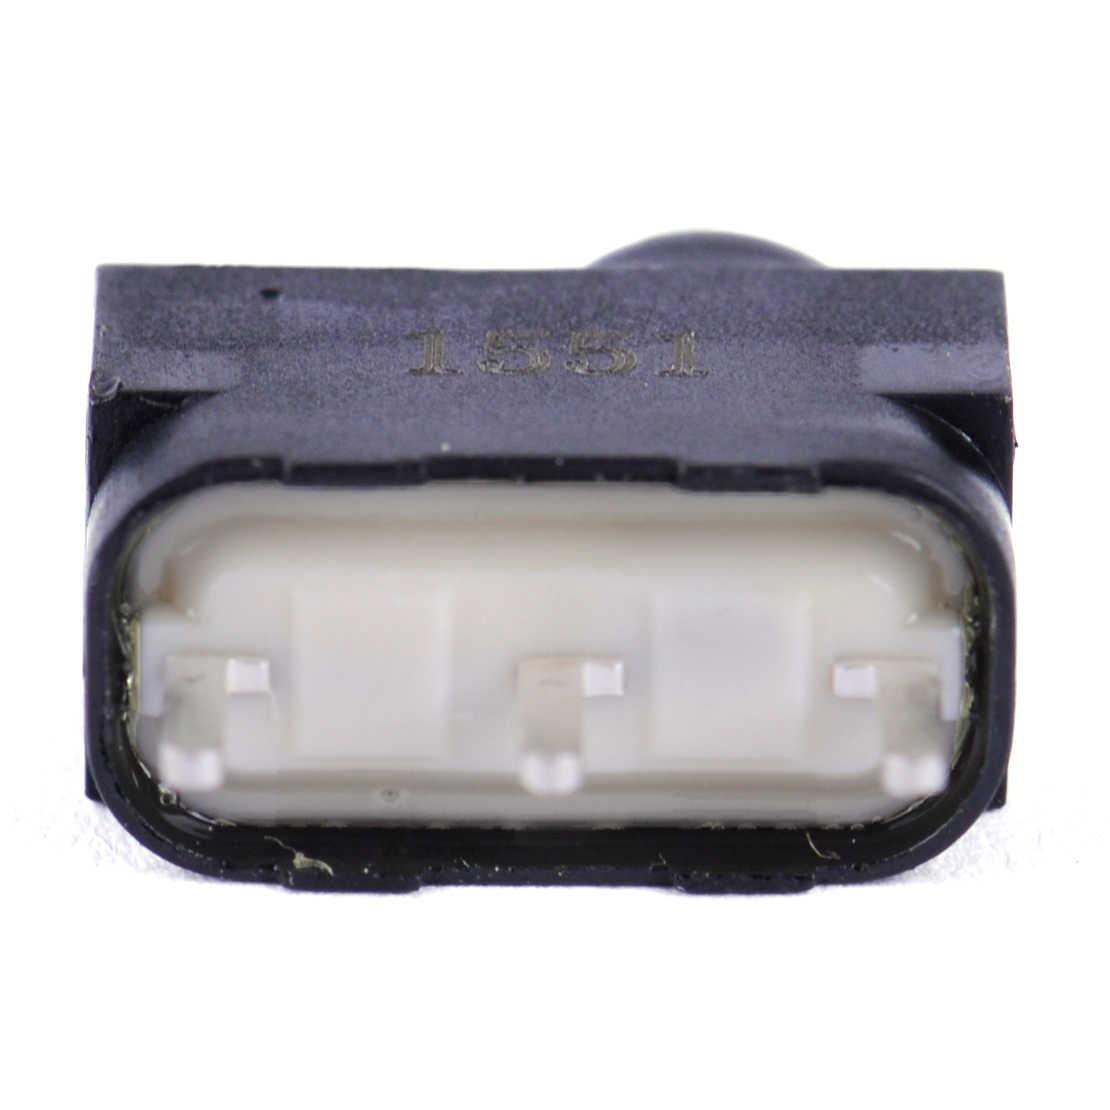 2pcs 3 Pin Lock Ignition Micro Switch Button for Audi A6L Q7 J518 Module